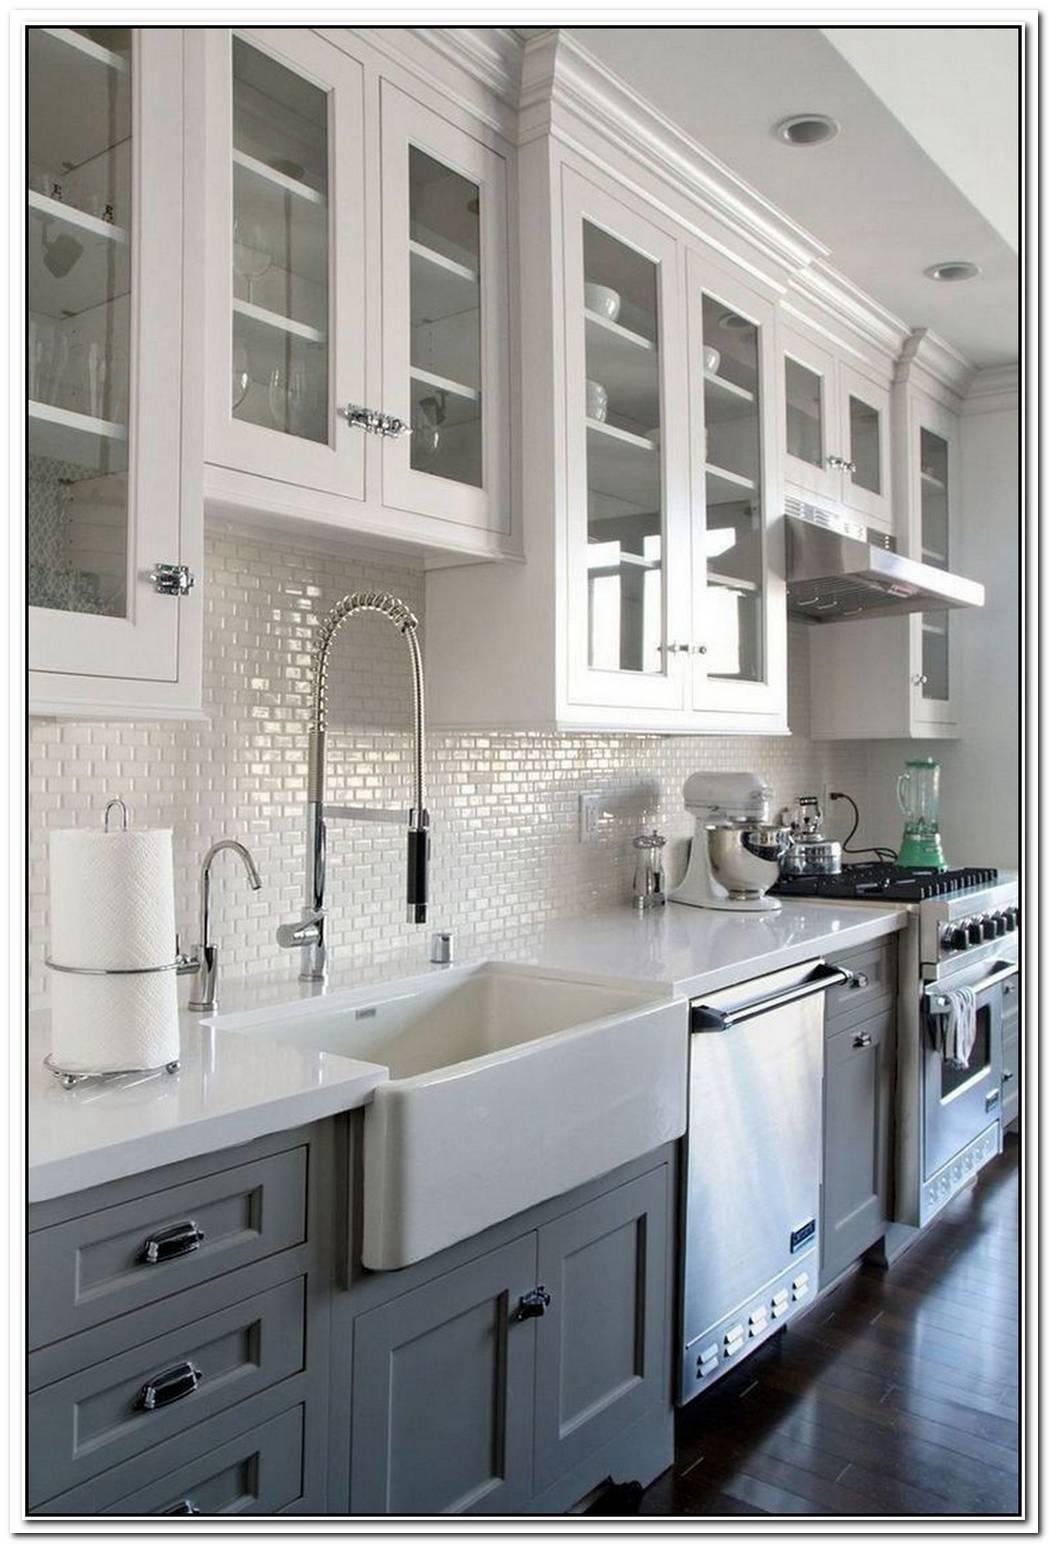 Kitchen Design Ideas With Many Storage Option